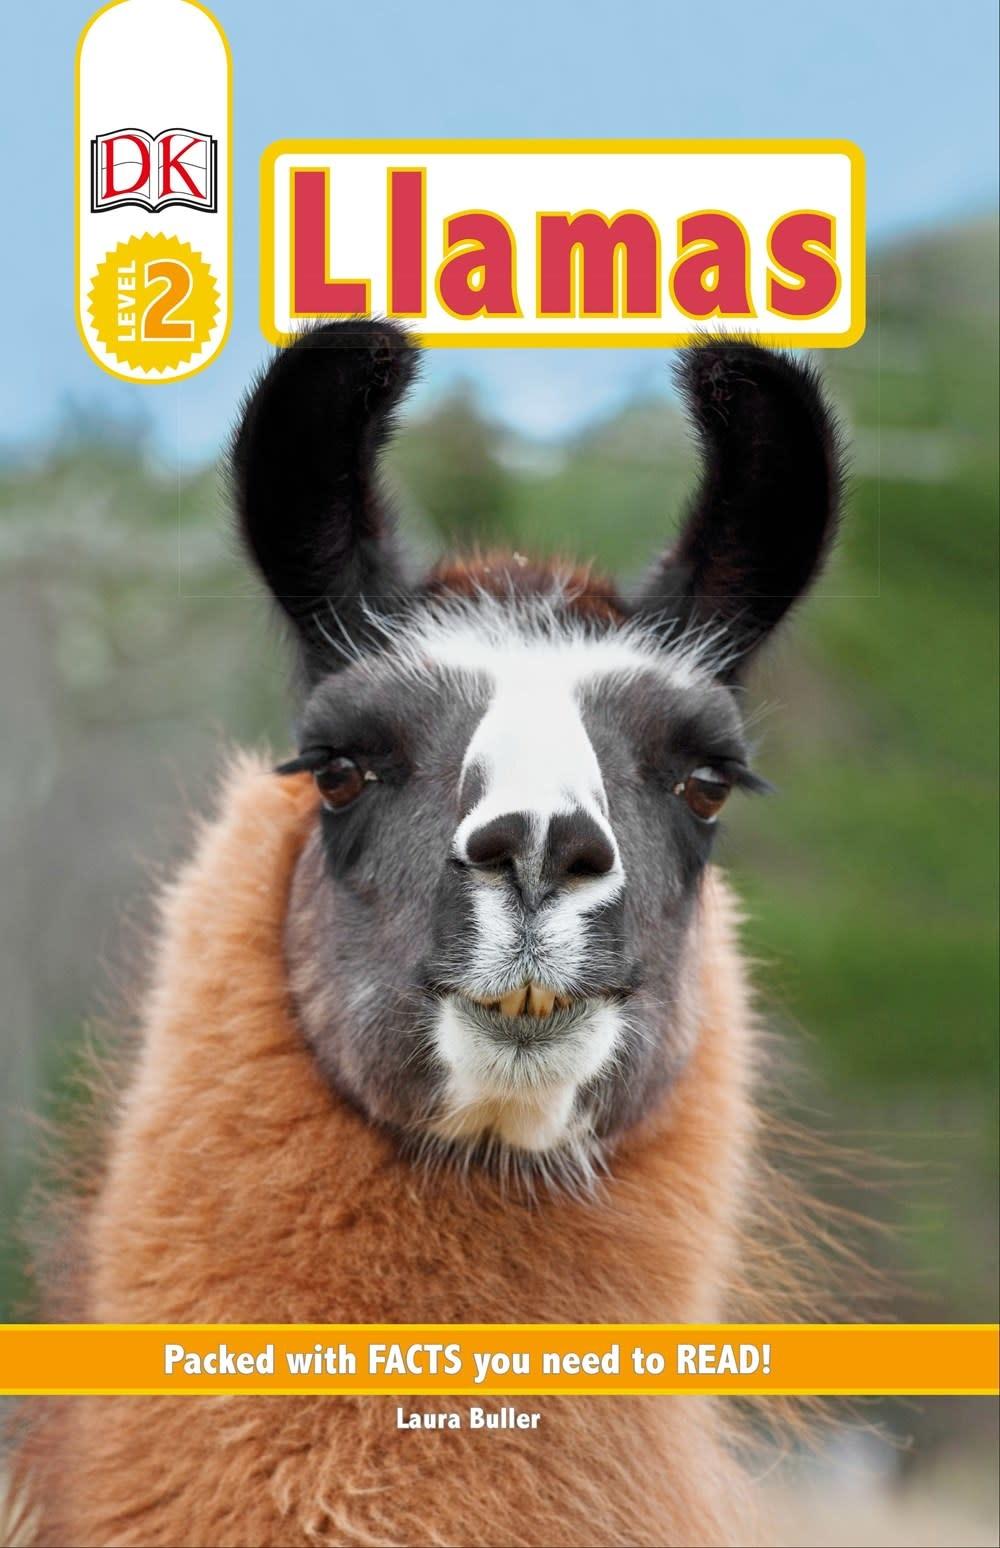 DK Children DK Readers Level 2: Llamas